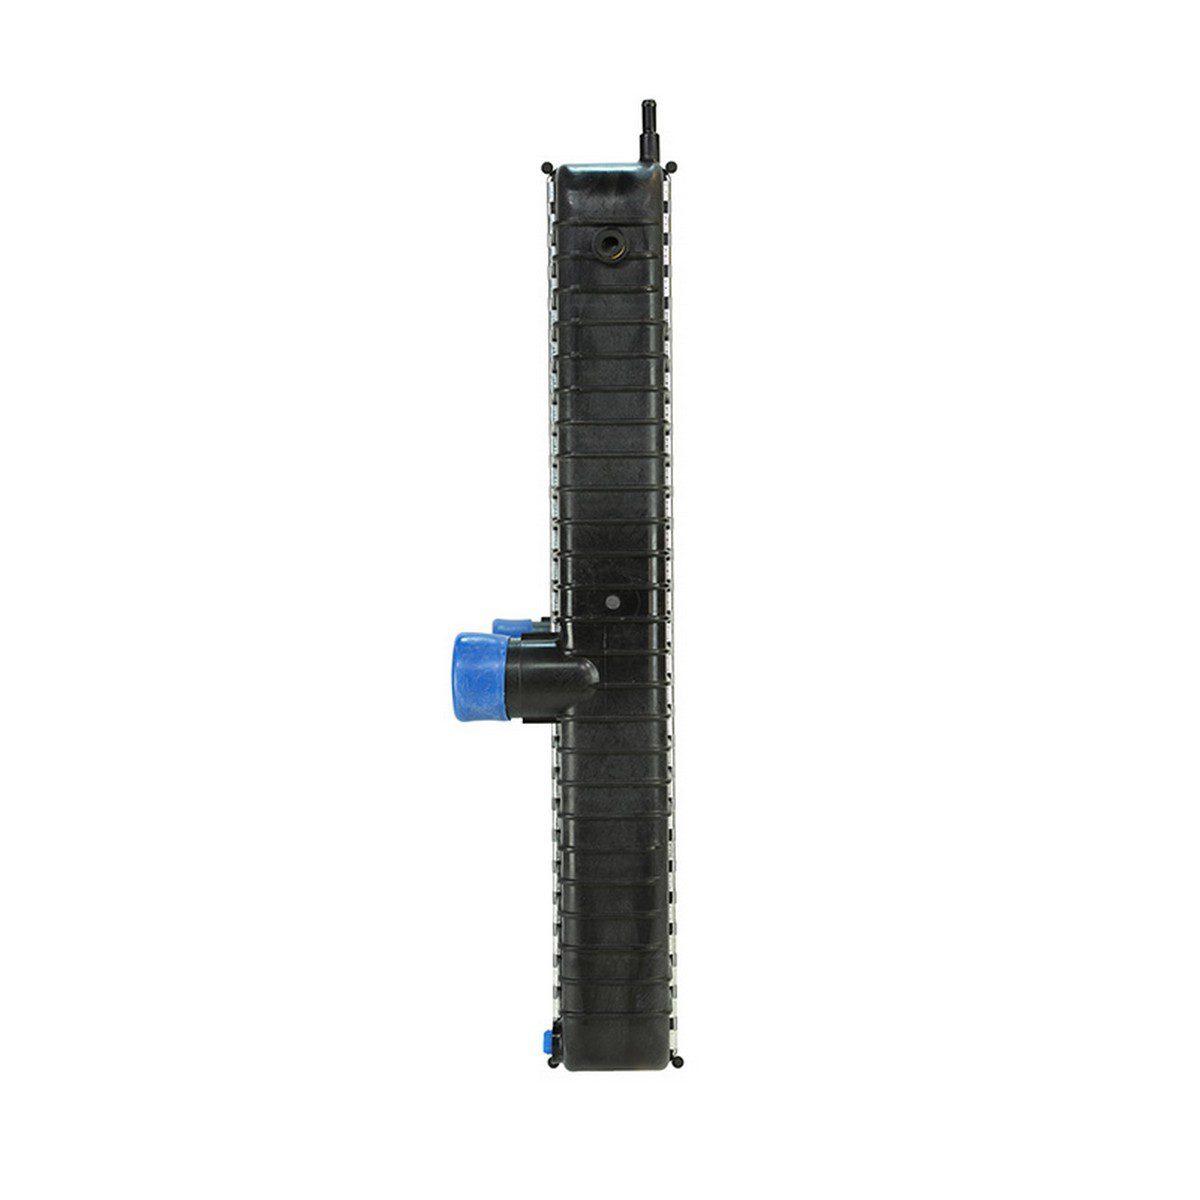 international 3000 7900 series 02 07 radiator oem 2509358c92 7